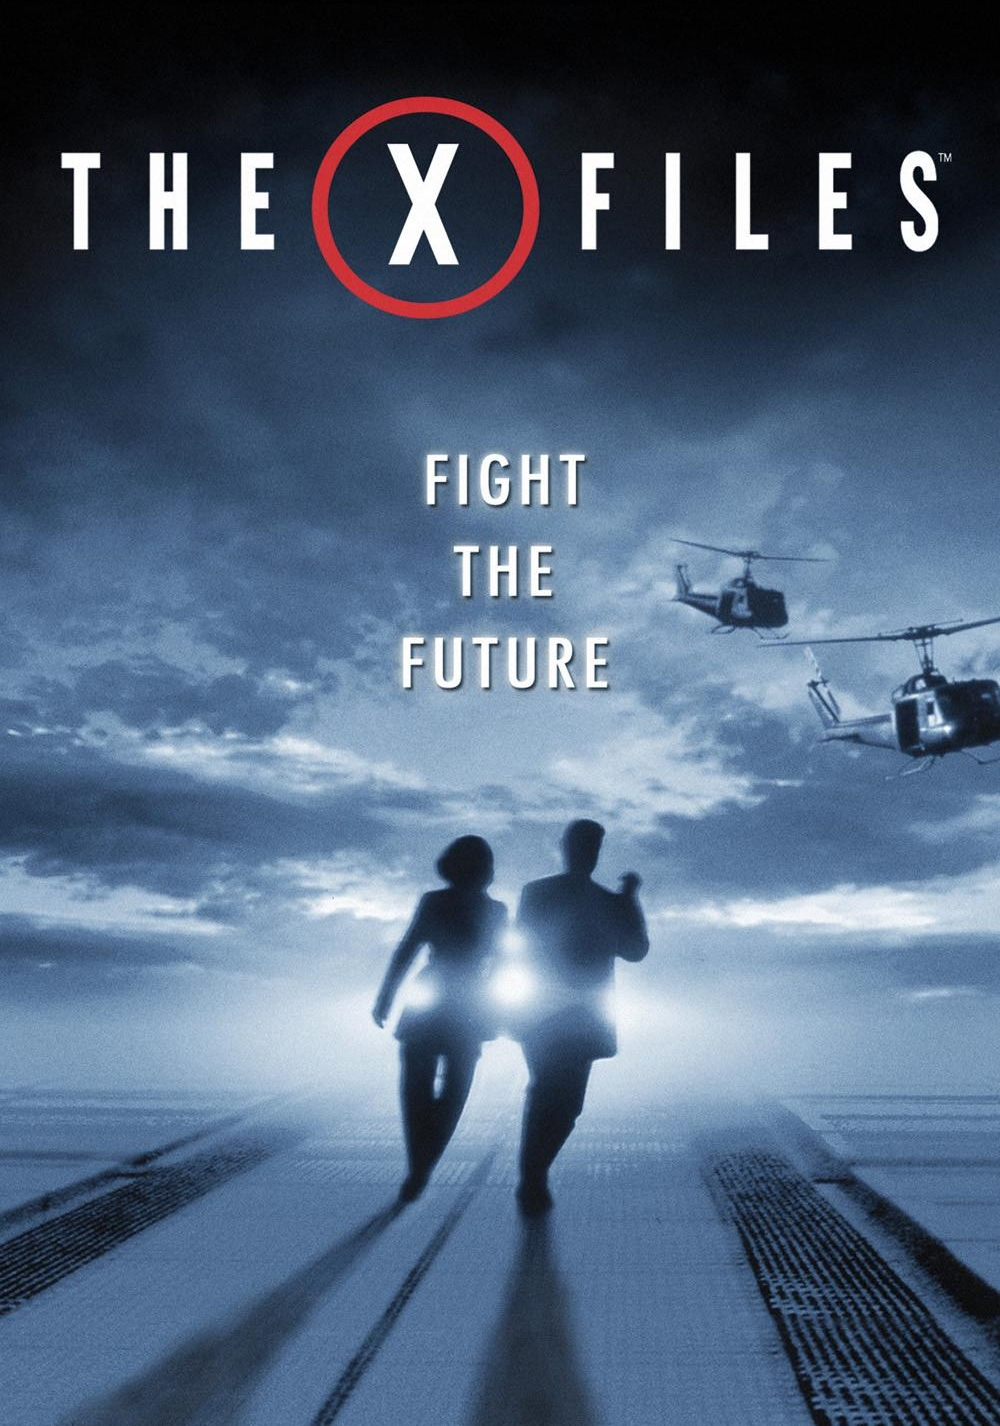 The X Files 1.jpg